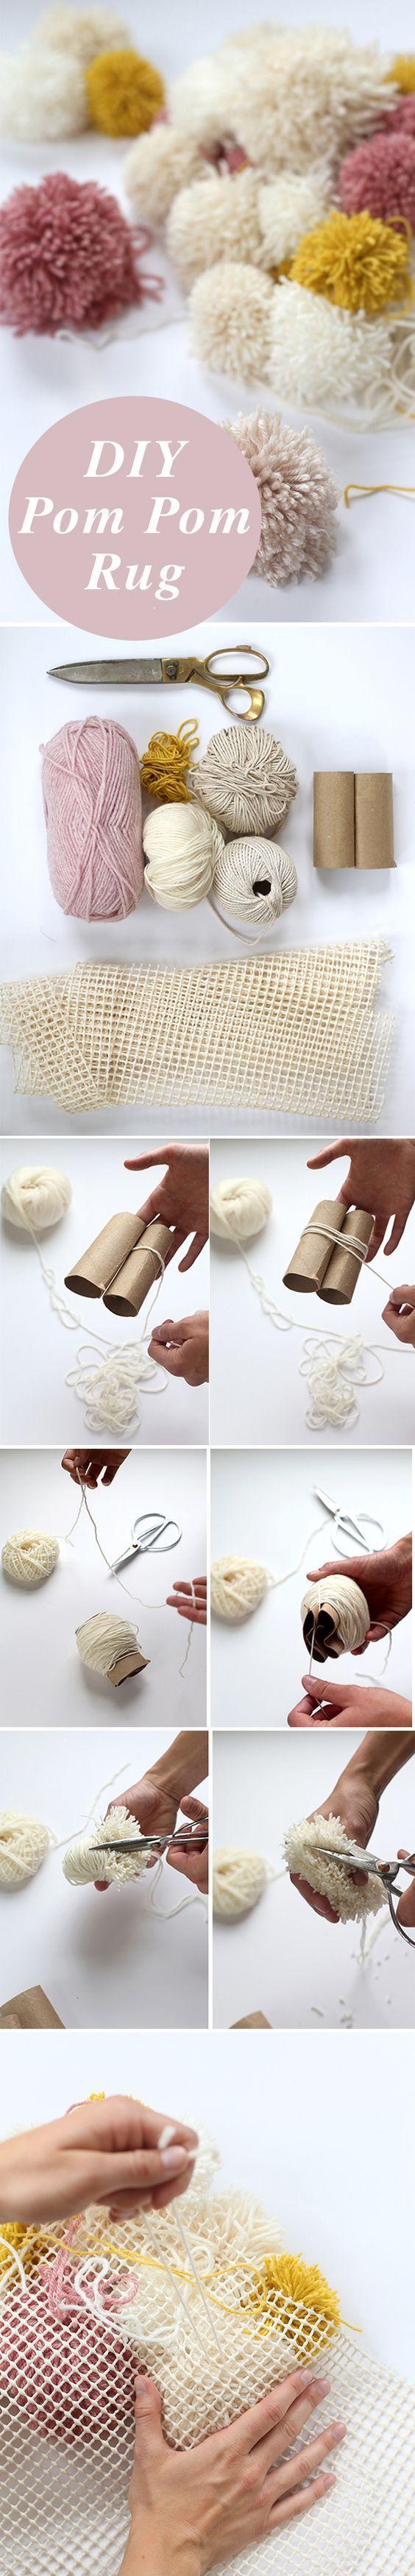 DIY Pom Pom Rug | 17 Cozy DIY Projects to Keep You Warm This Winter